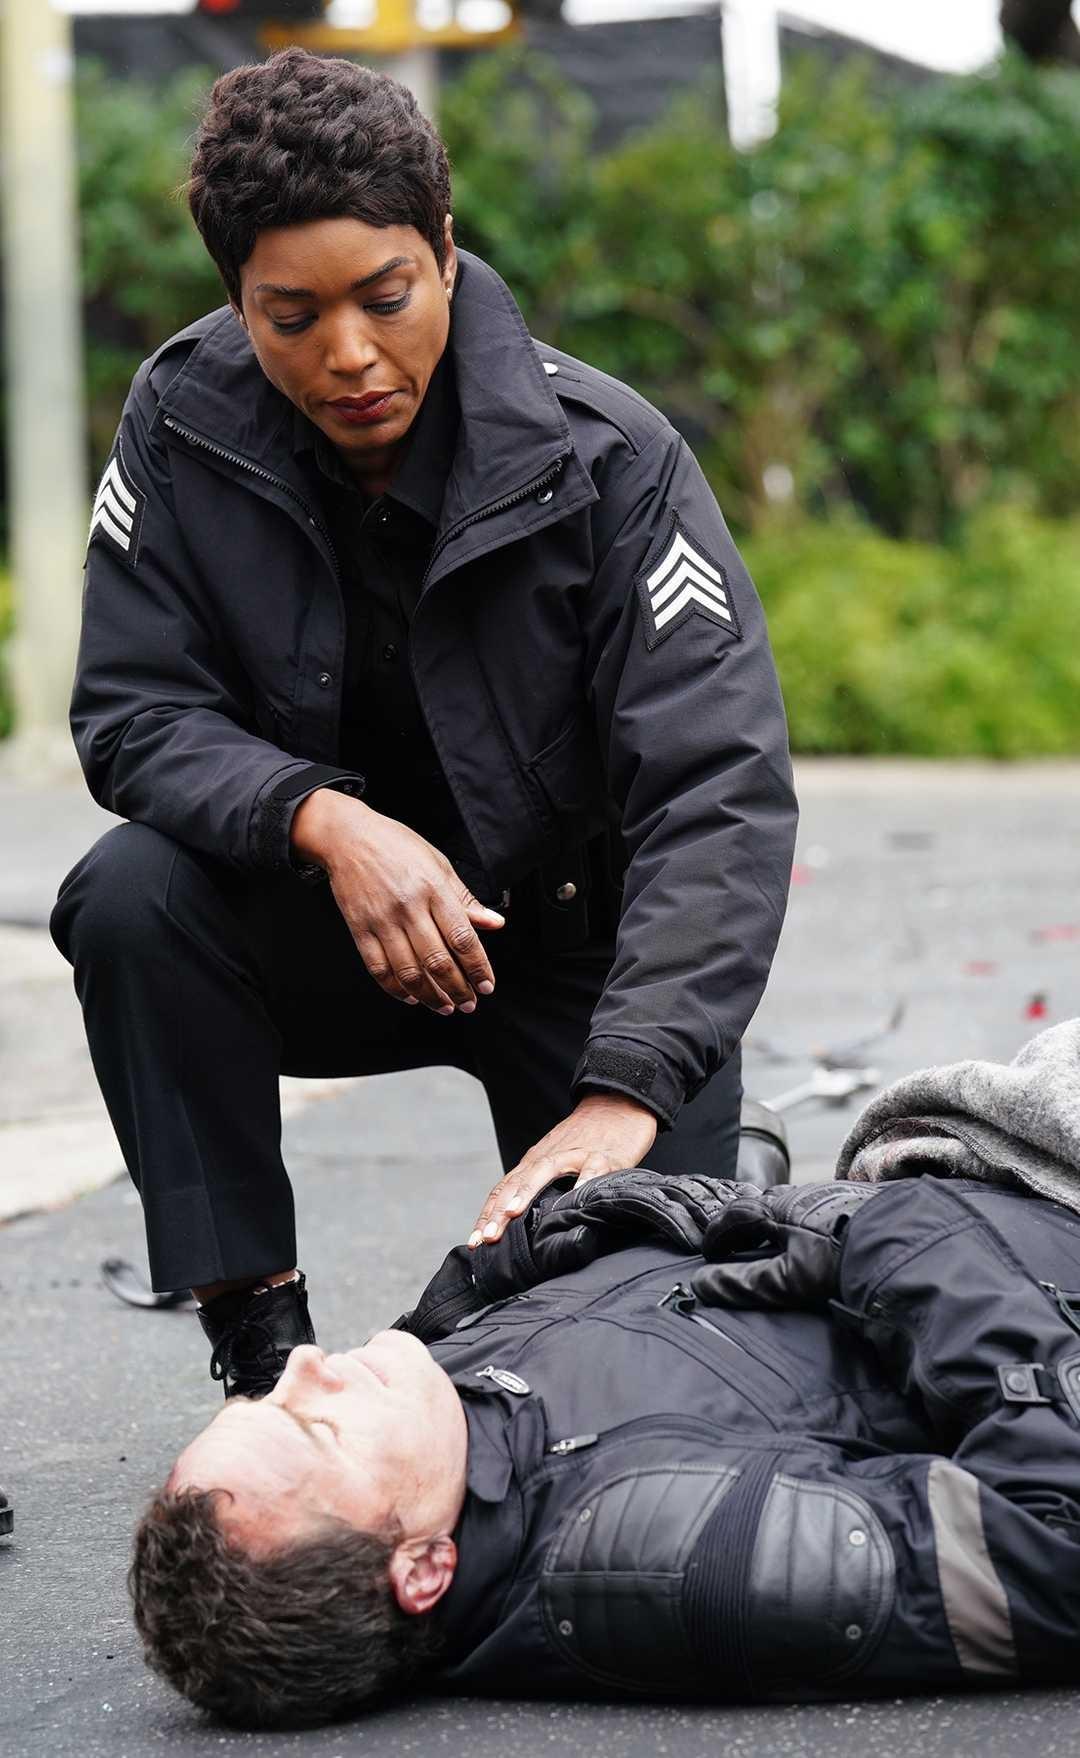 Herečka Angela Bassett v seriáli 9-1-1 ako policajtka Athena Grant